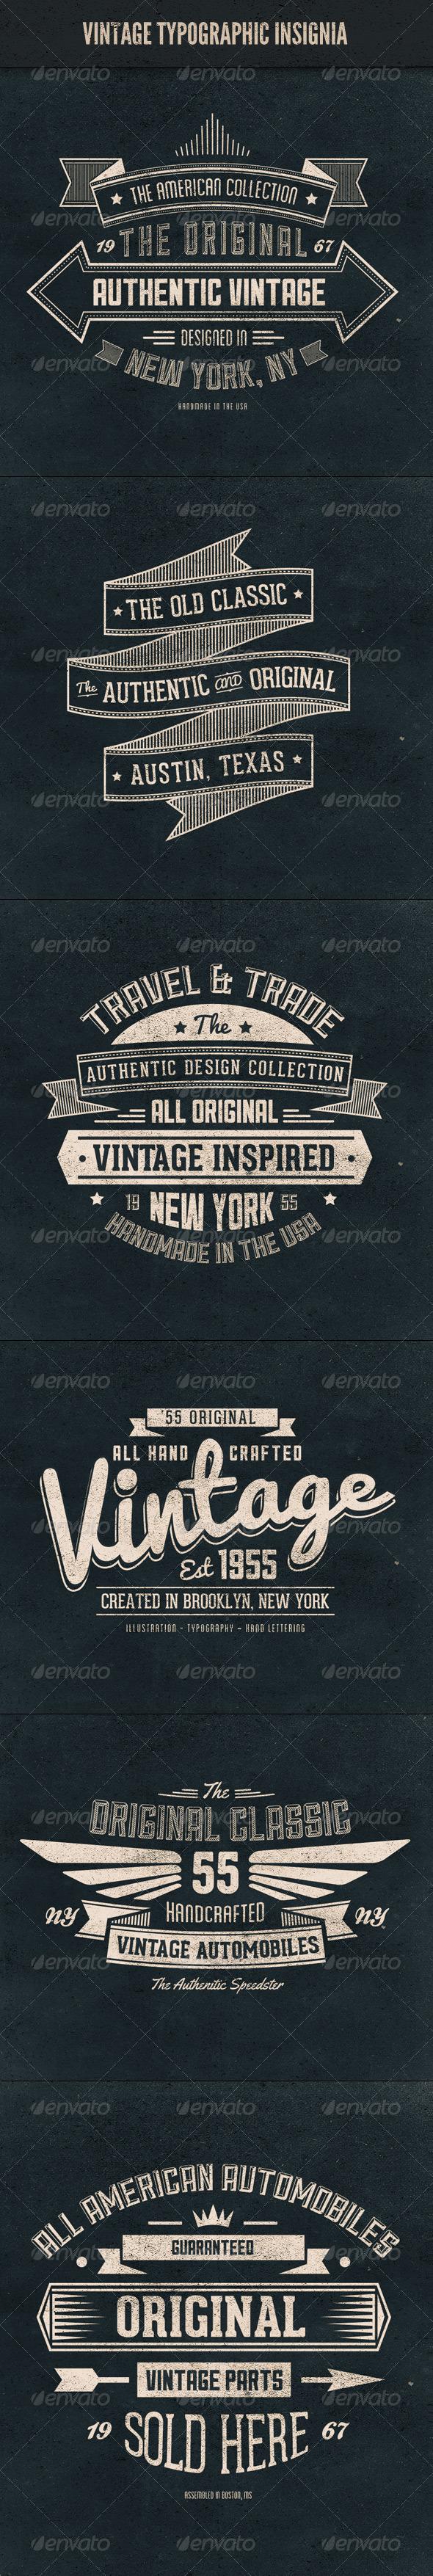 GraphicRiver Vintage Typographic Insignia 5804210